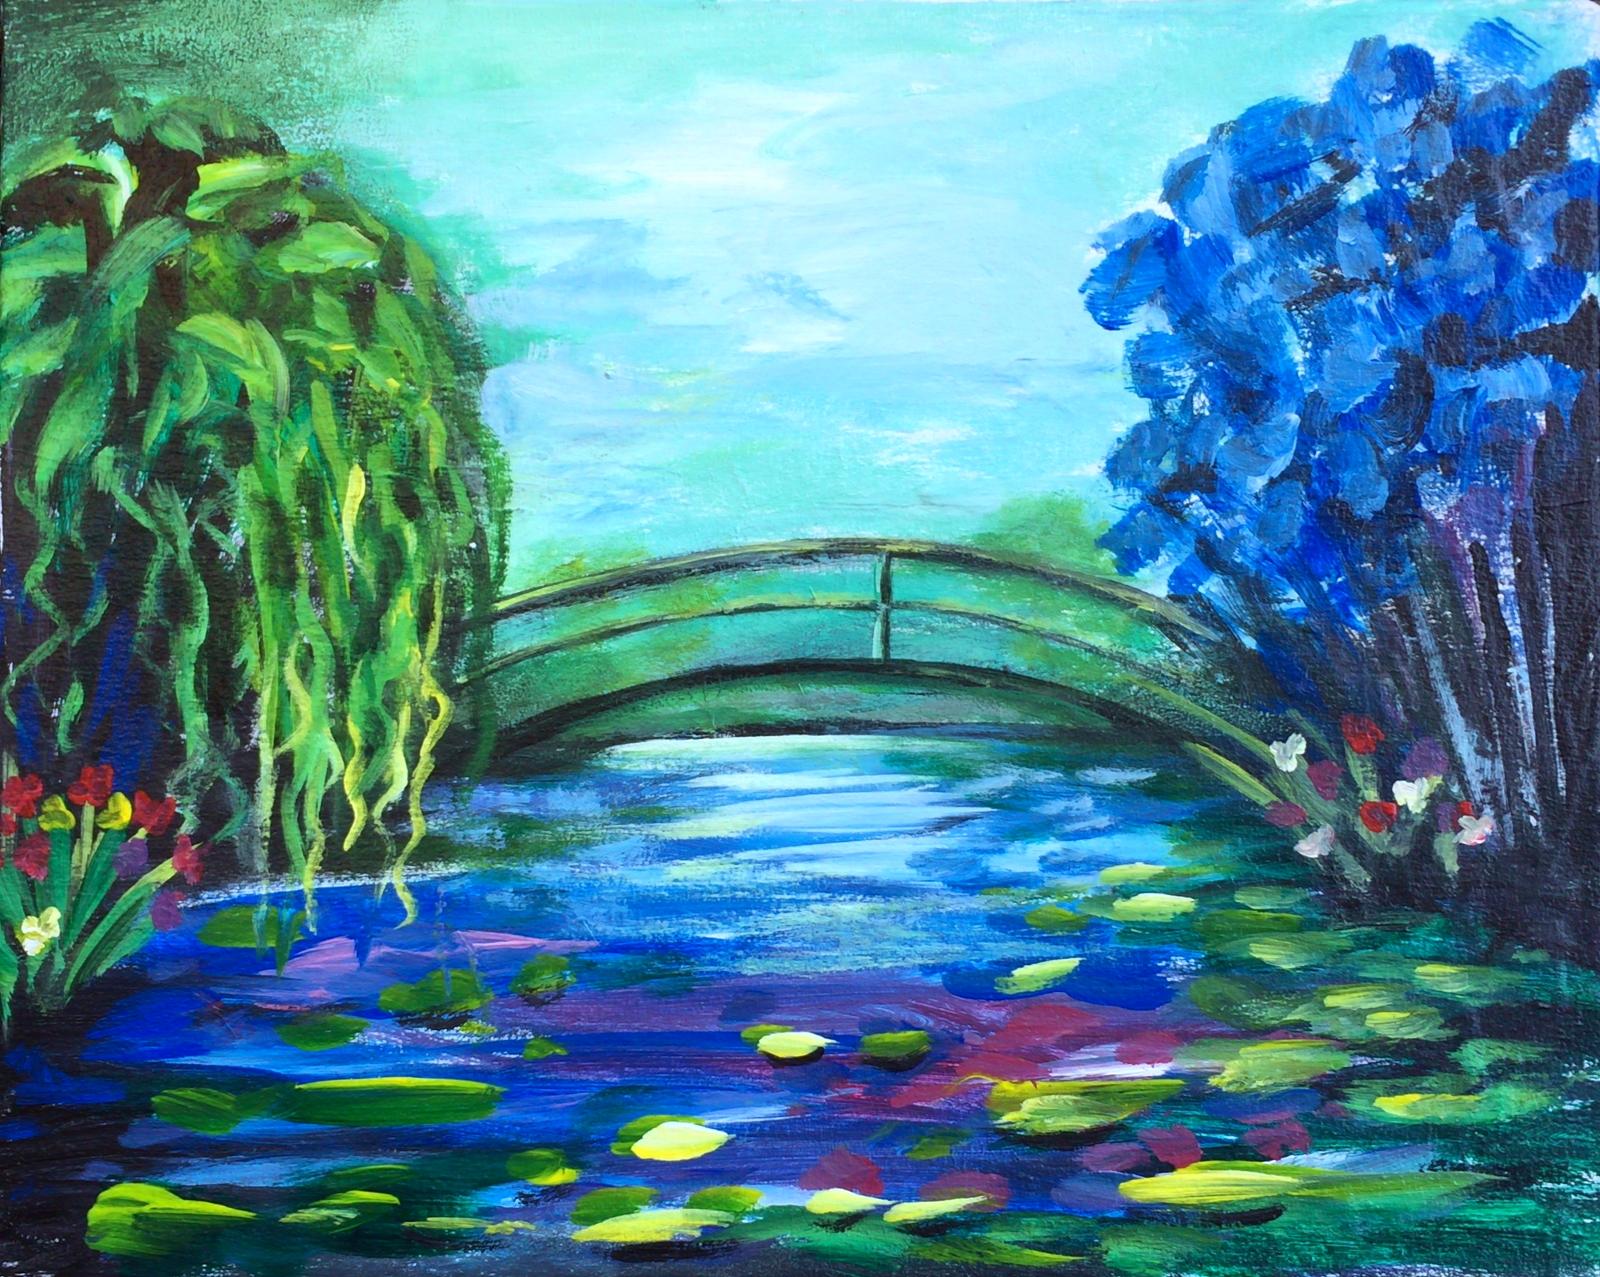 Monet's Garden | The Loaded Brush - Paint & Sip Classes | www.loadedbrushpdx.com